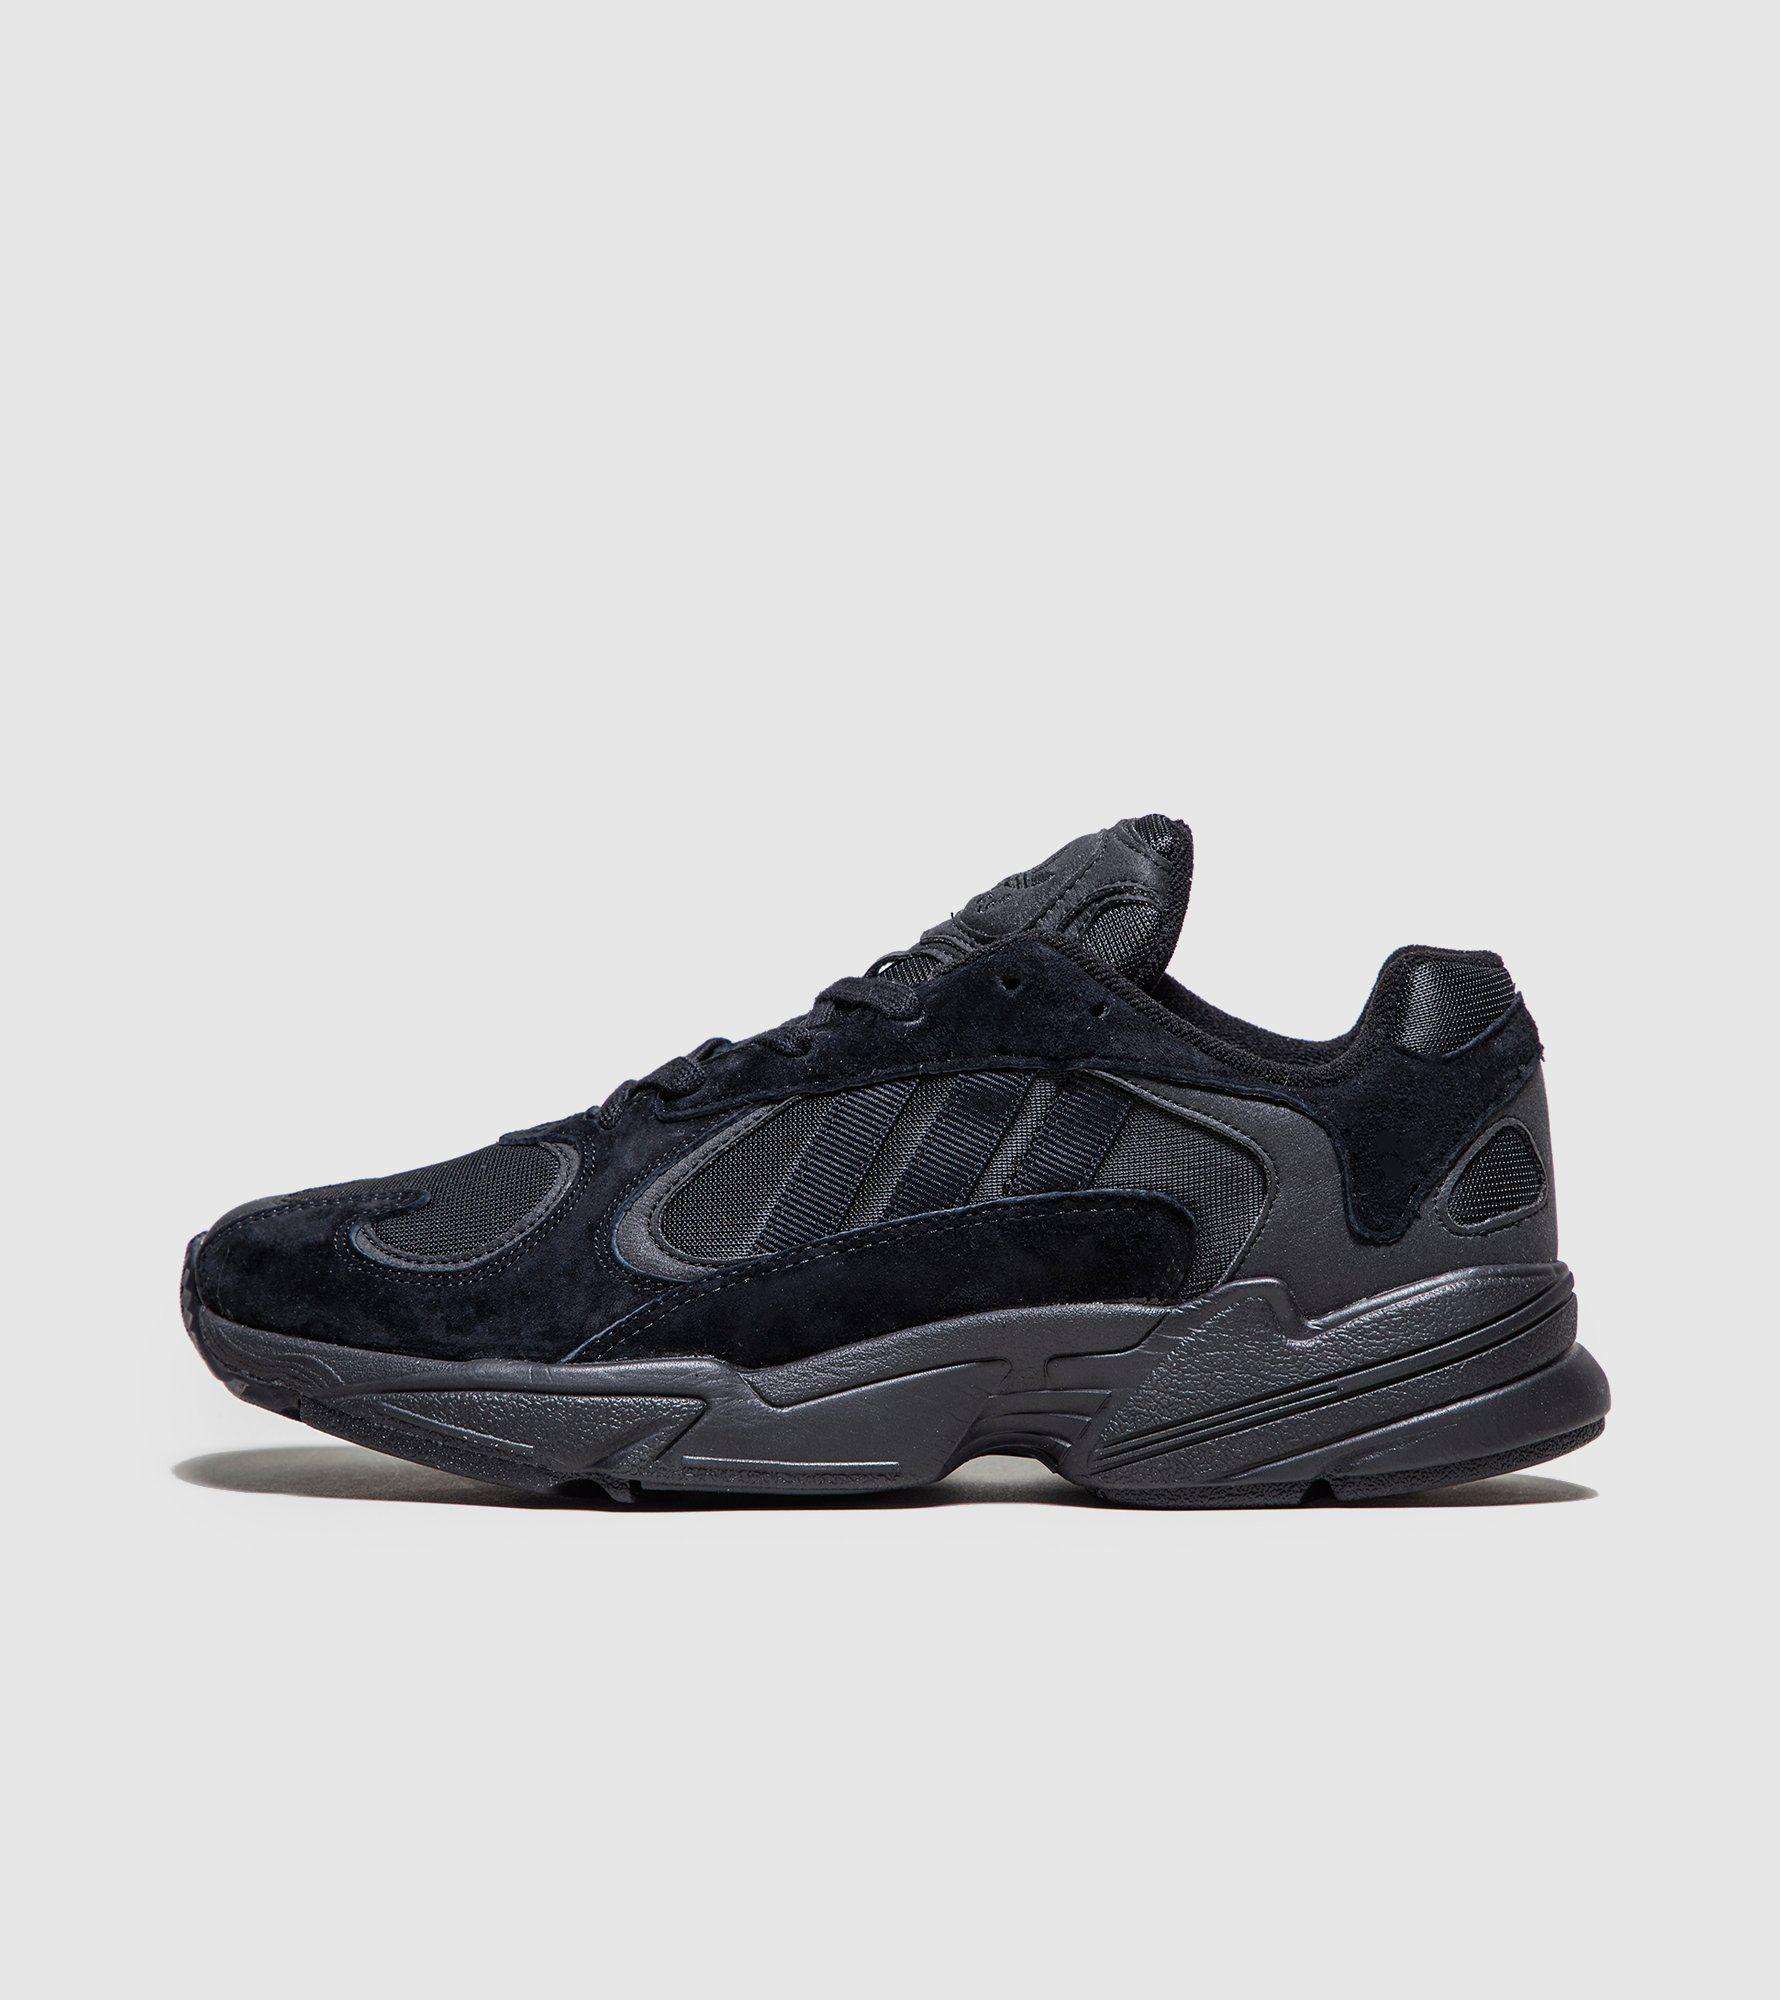 Adidas Originals Yung 1 Size